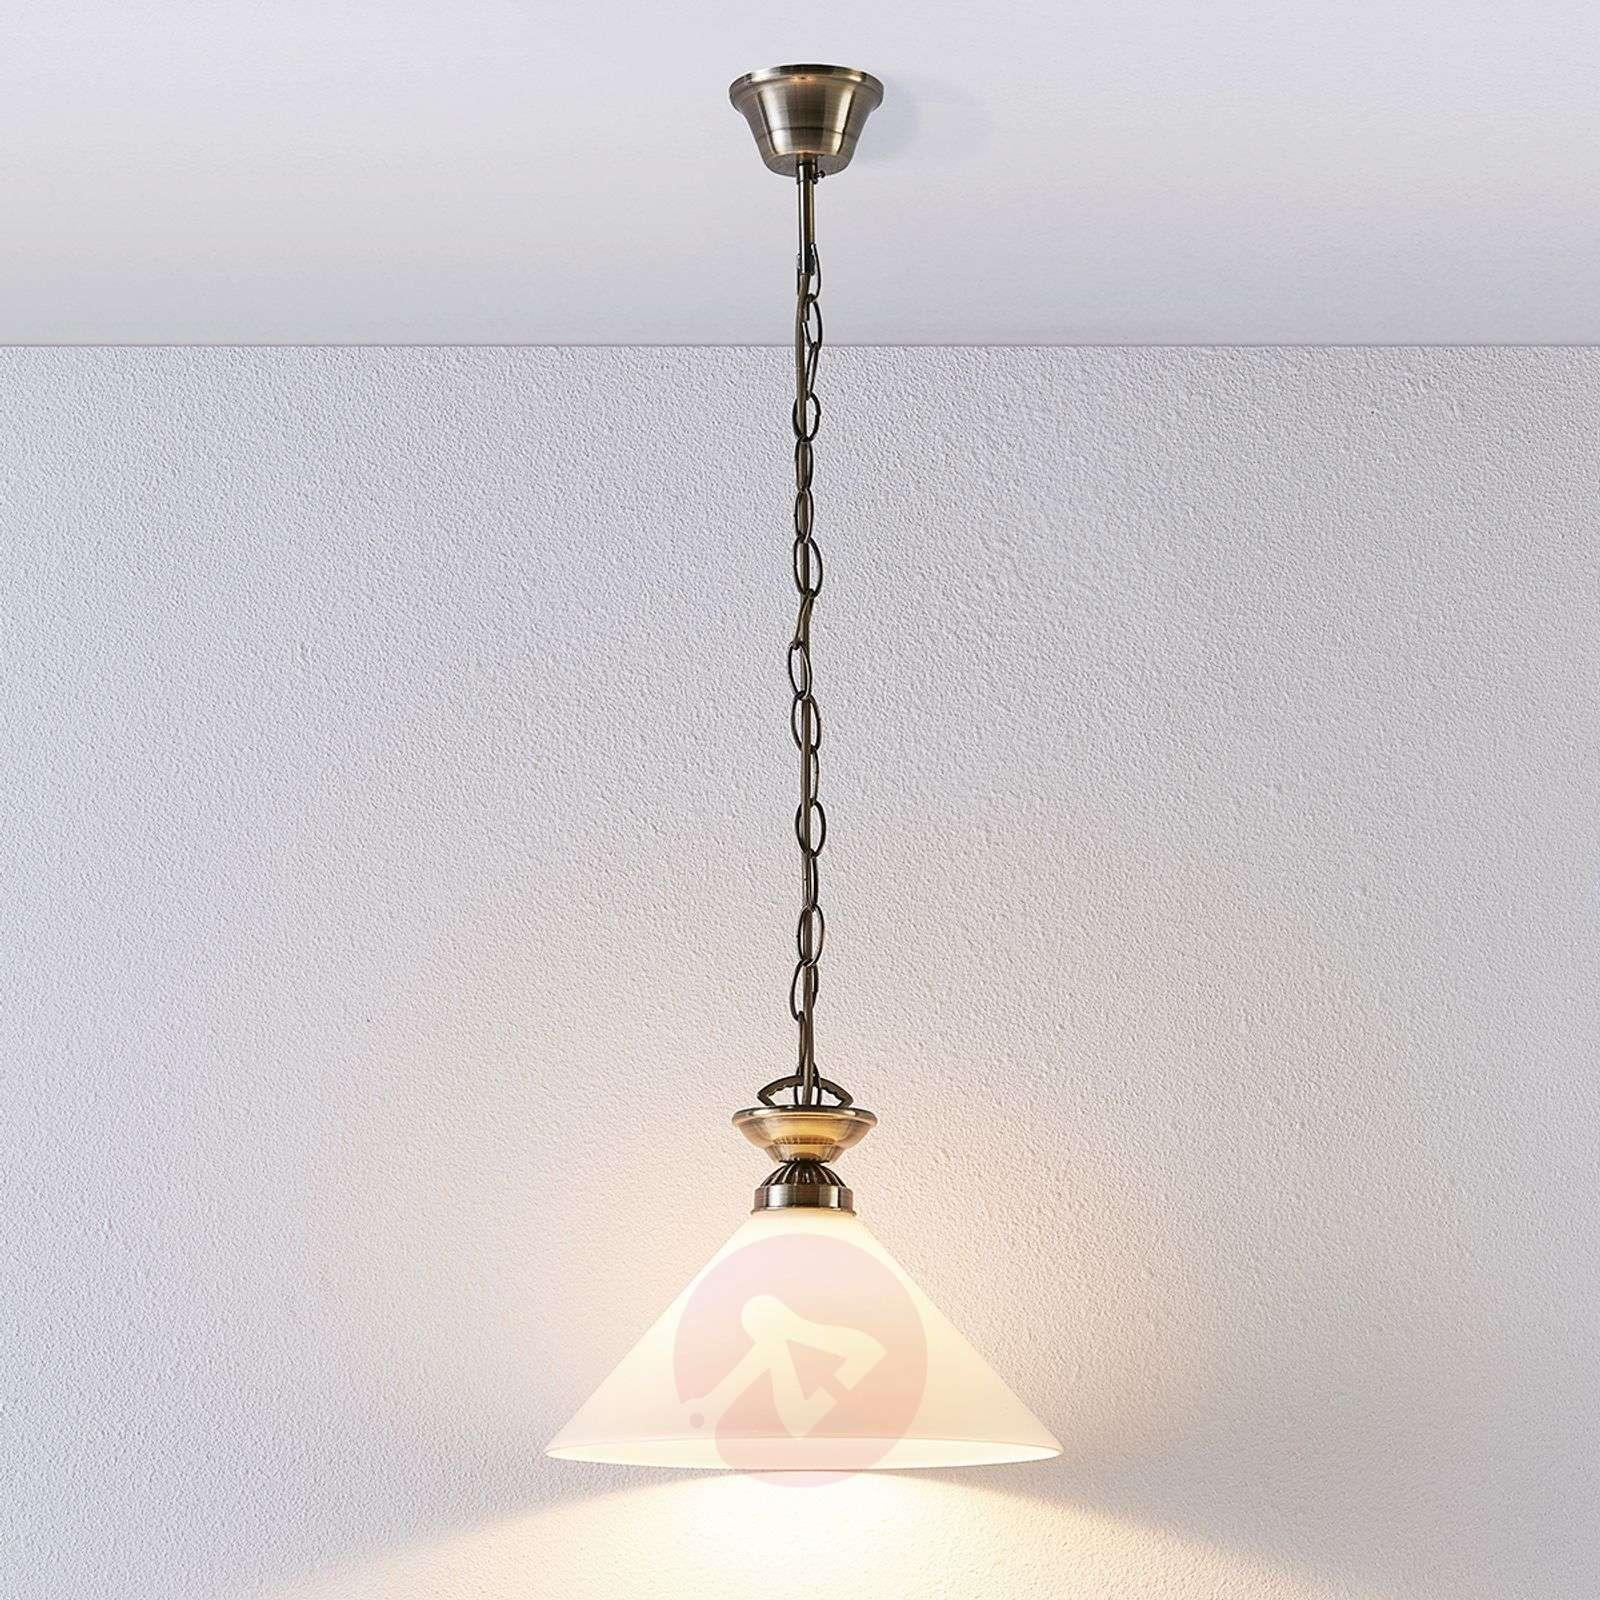 Glass pendant lamp Otis, antique brass-9621031-03